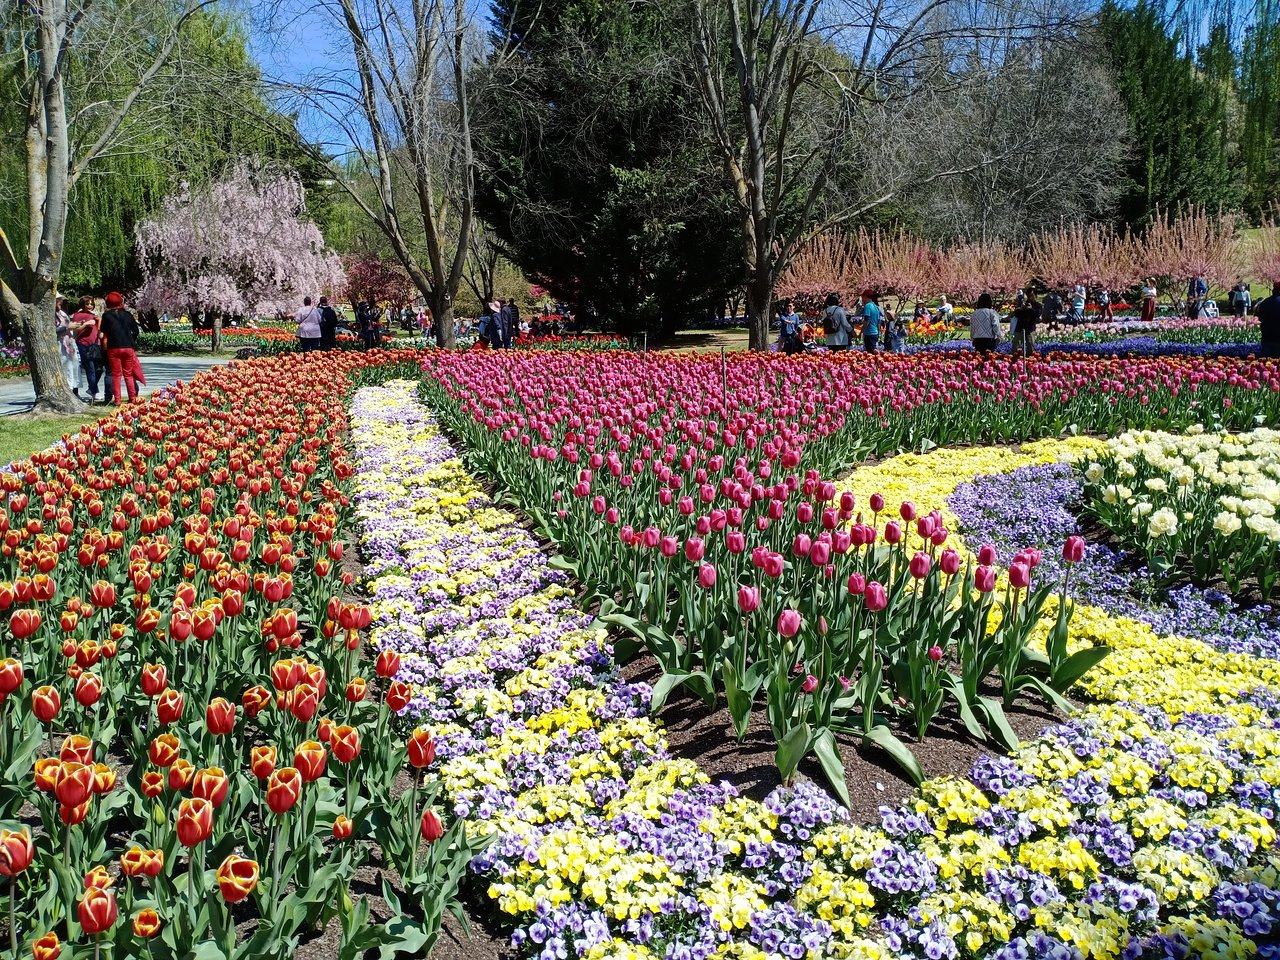 tulip top garden on 28 - Tulip Top Gardens 2019 Tulip Top Gardens 5 October